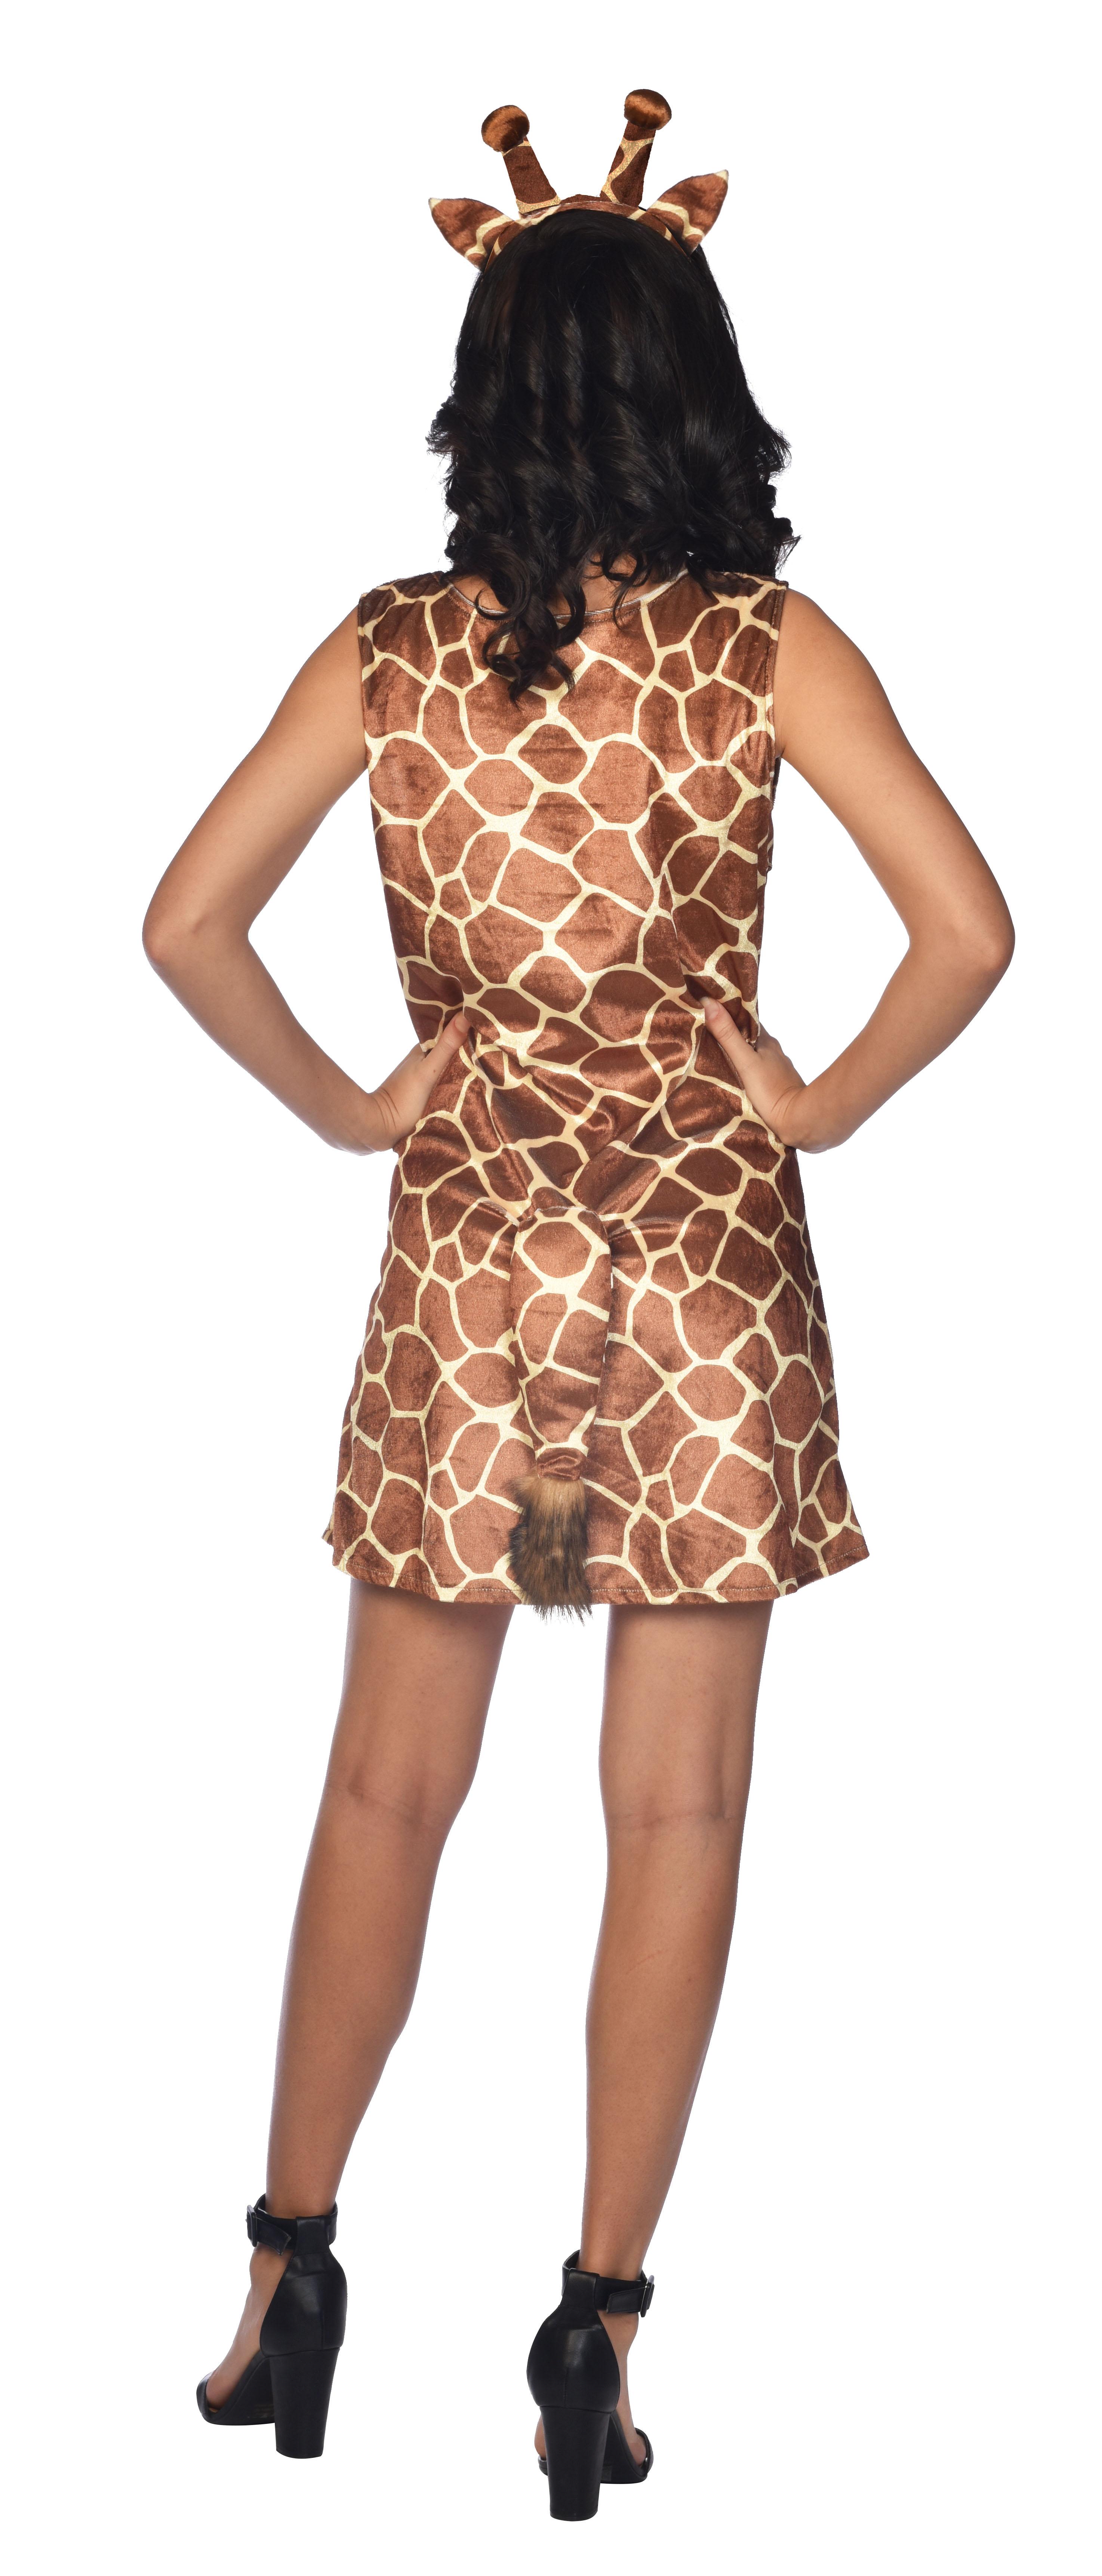 Indexbild 29 - Adult Ladies Zoo Safari Animal Giraffe Lady Fancy Dress Costume Womens Outfit